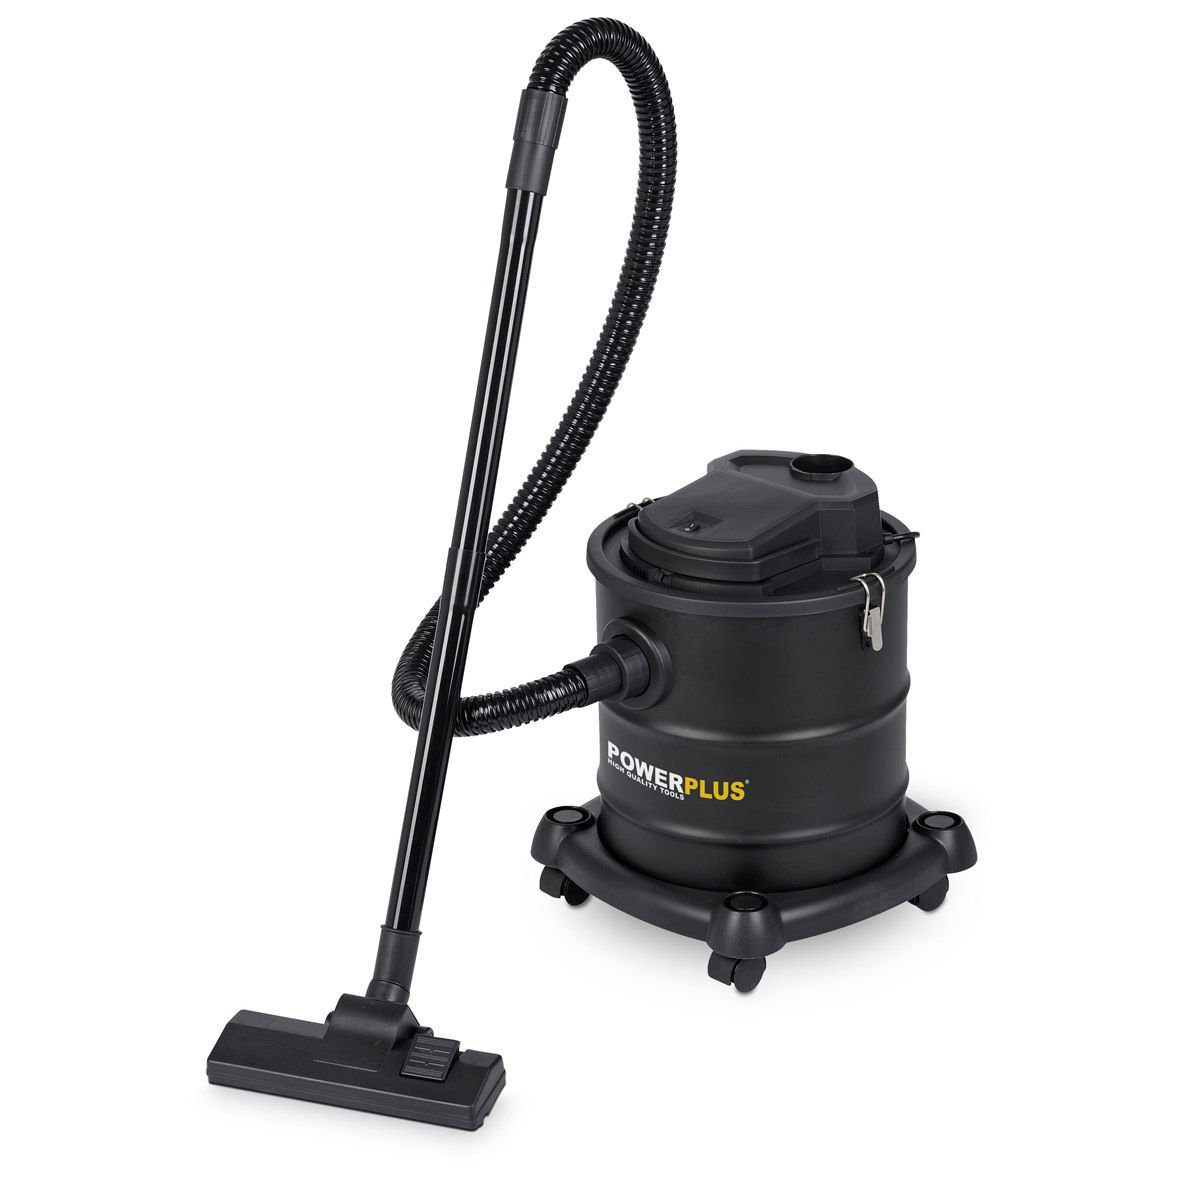 powerplus 1200 watt 20l ash debris collector bbq fireplace vacuum